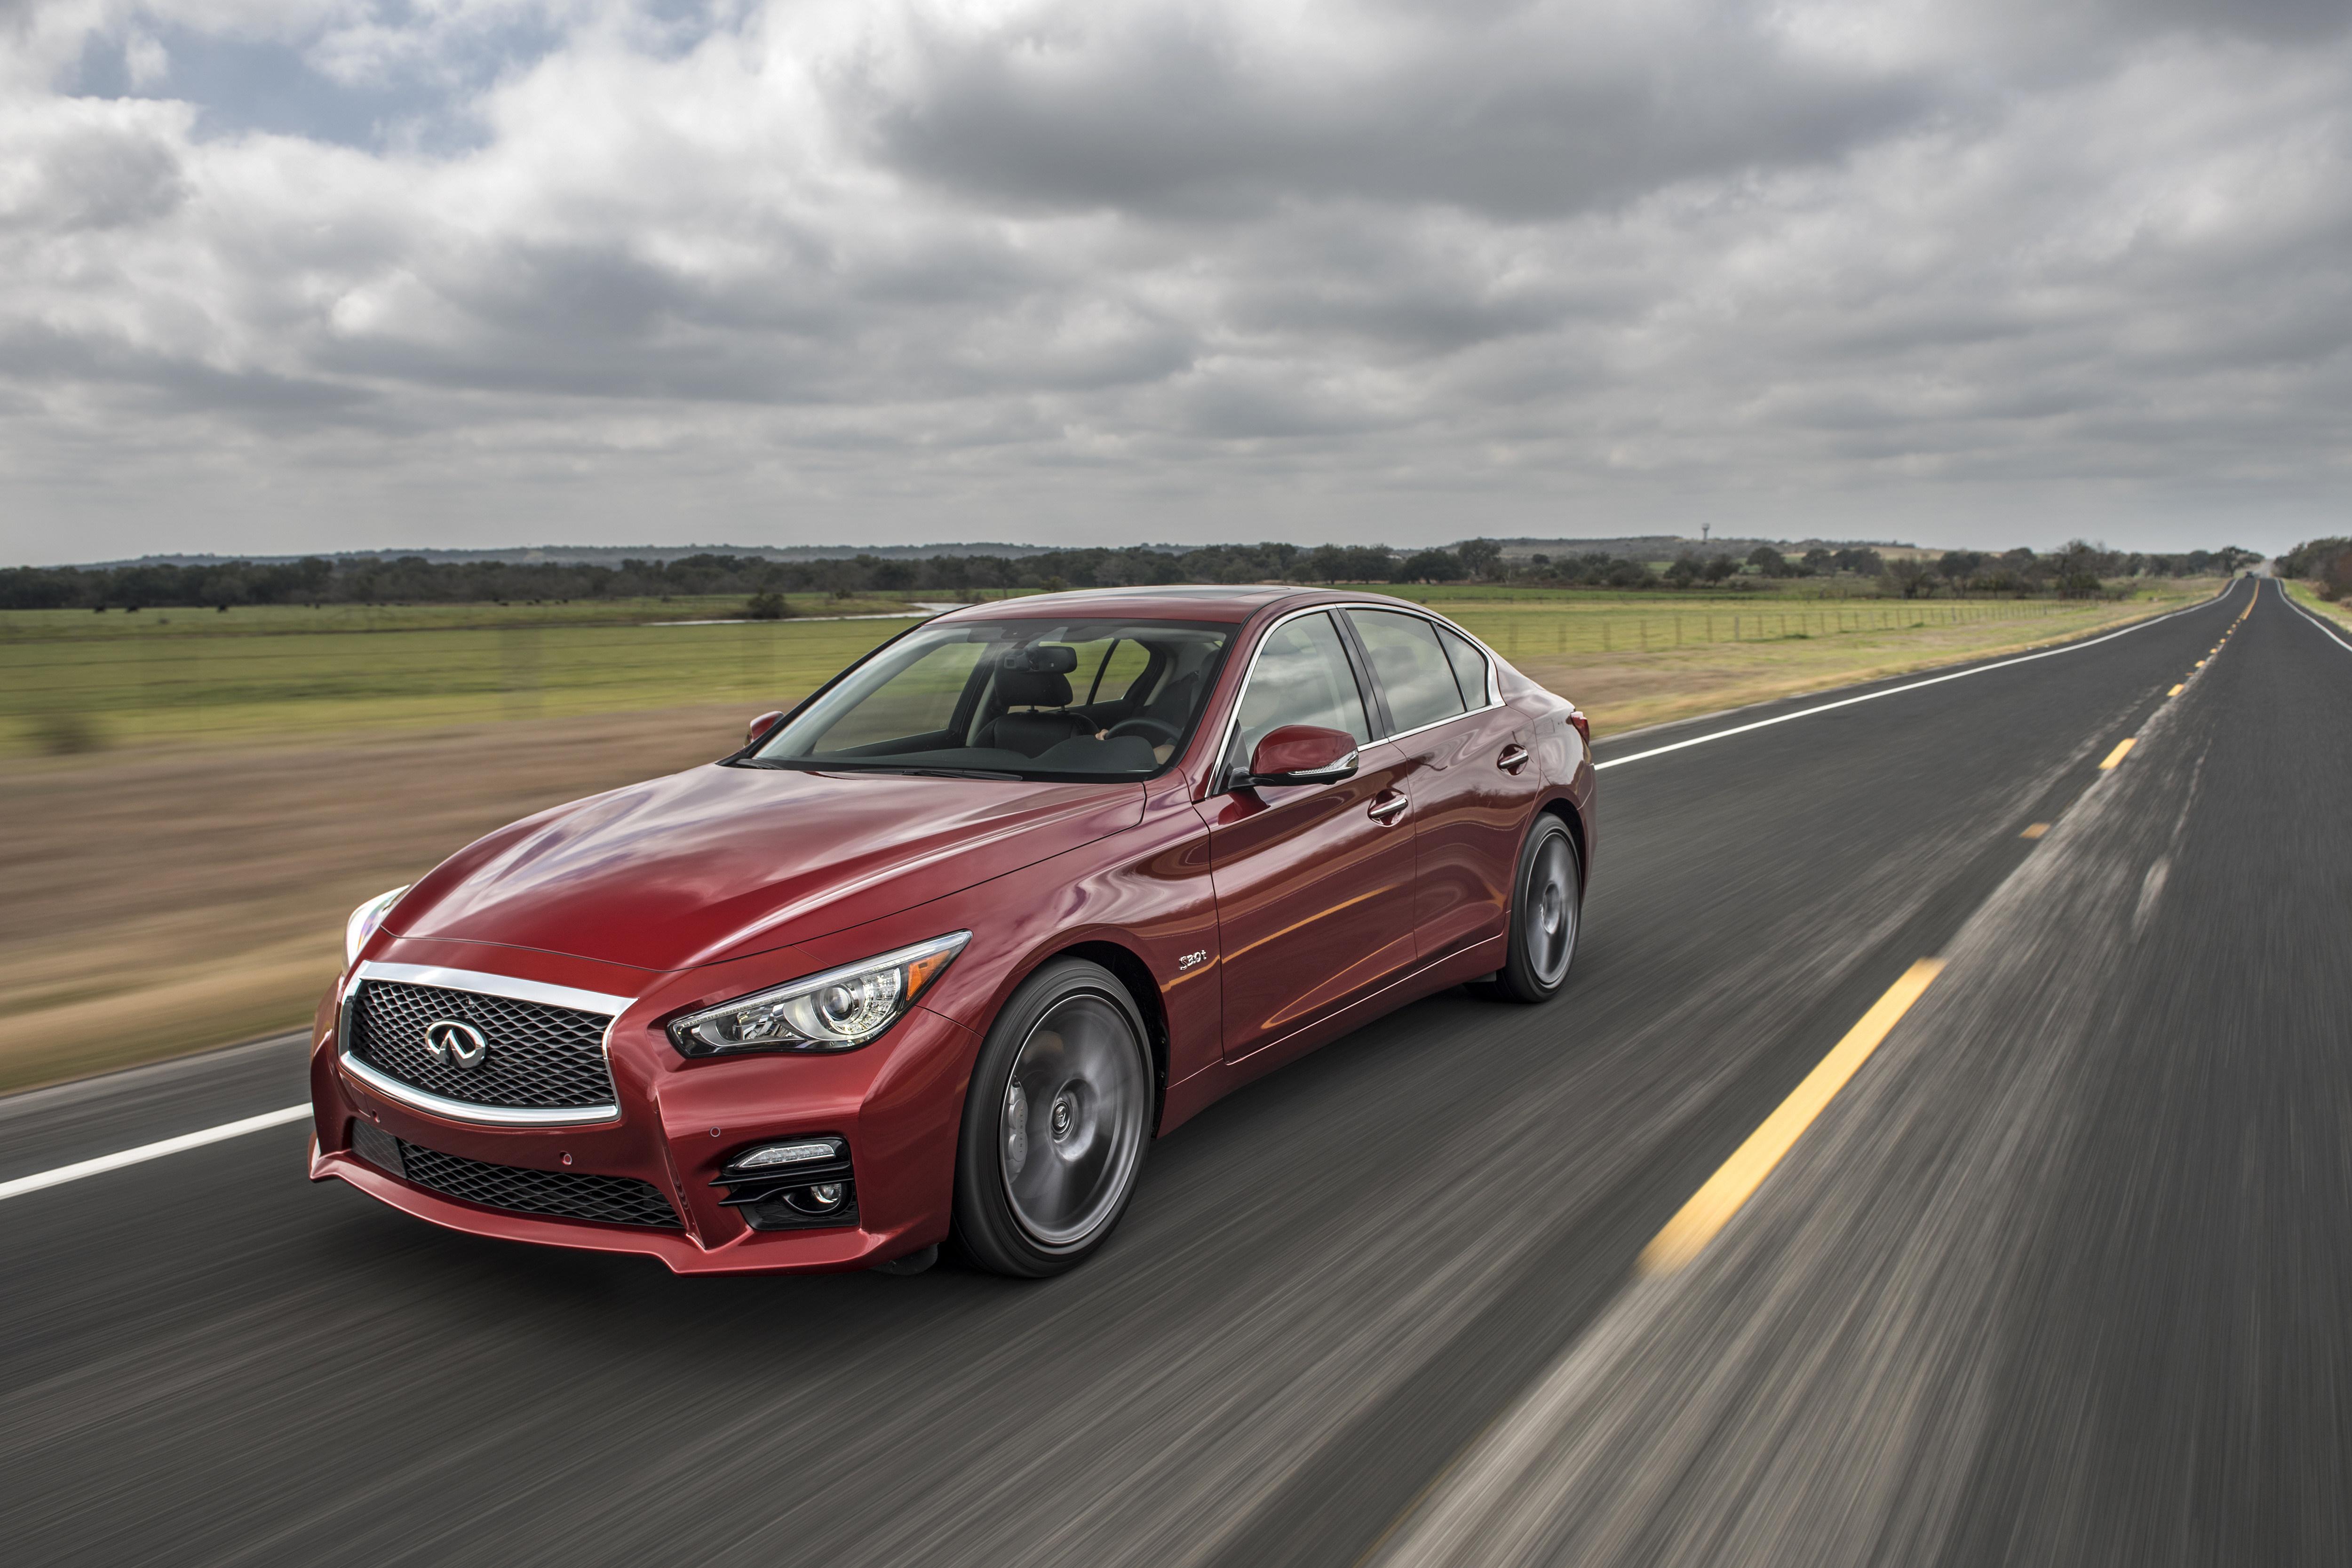 vid infiniti infinity car review video automobile